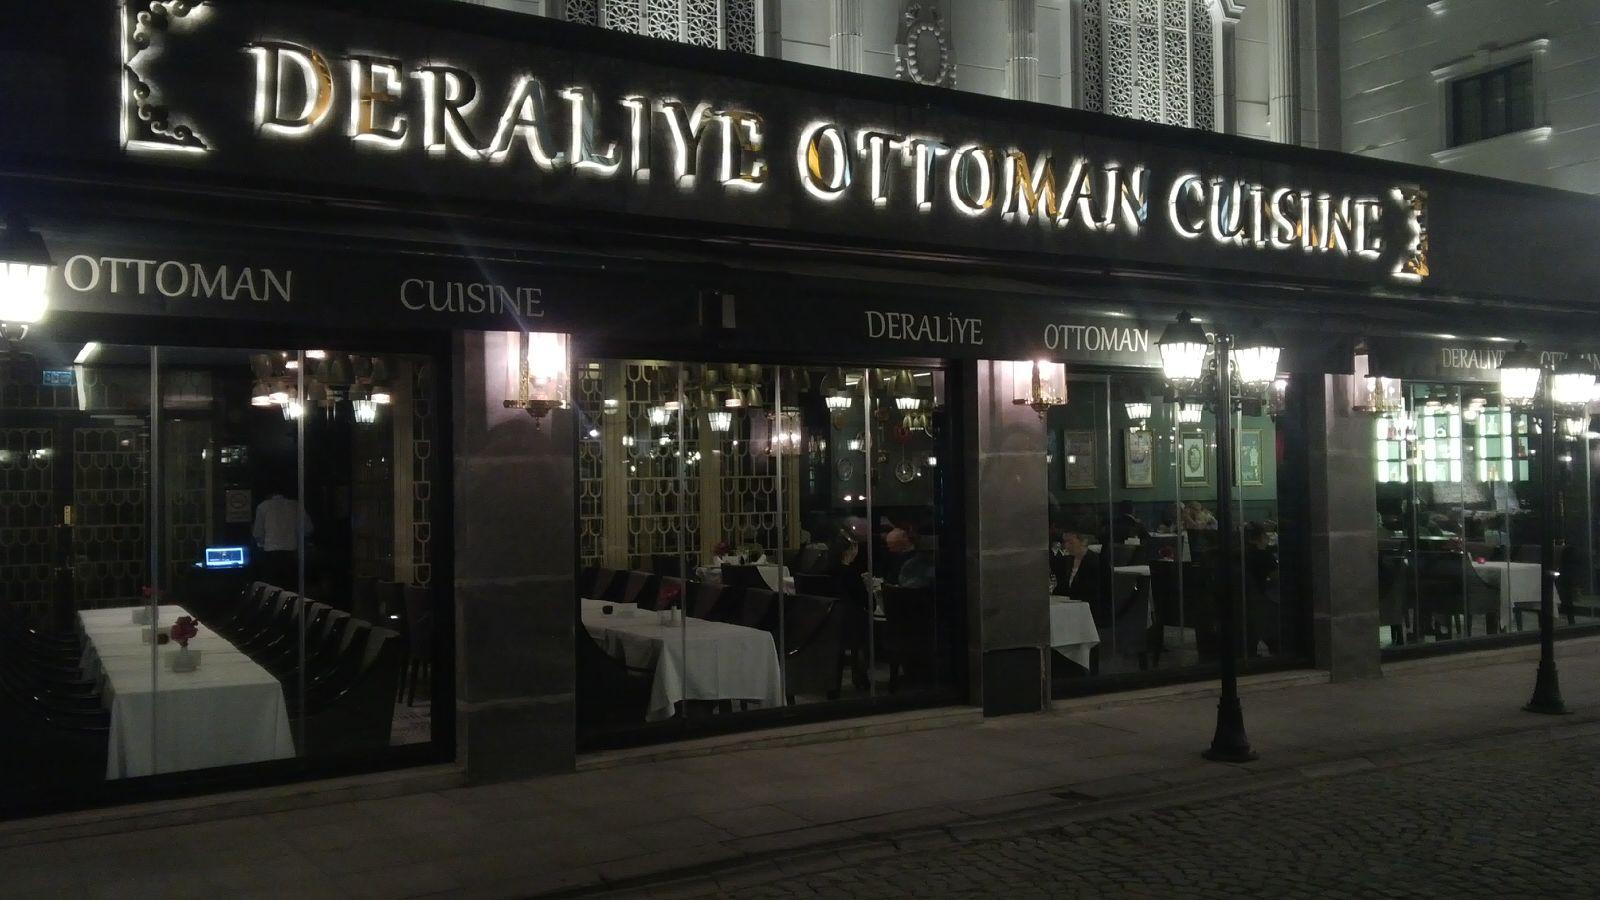 Deraliye Ottoman Palace Restaurant